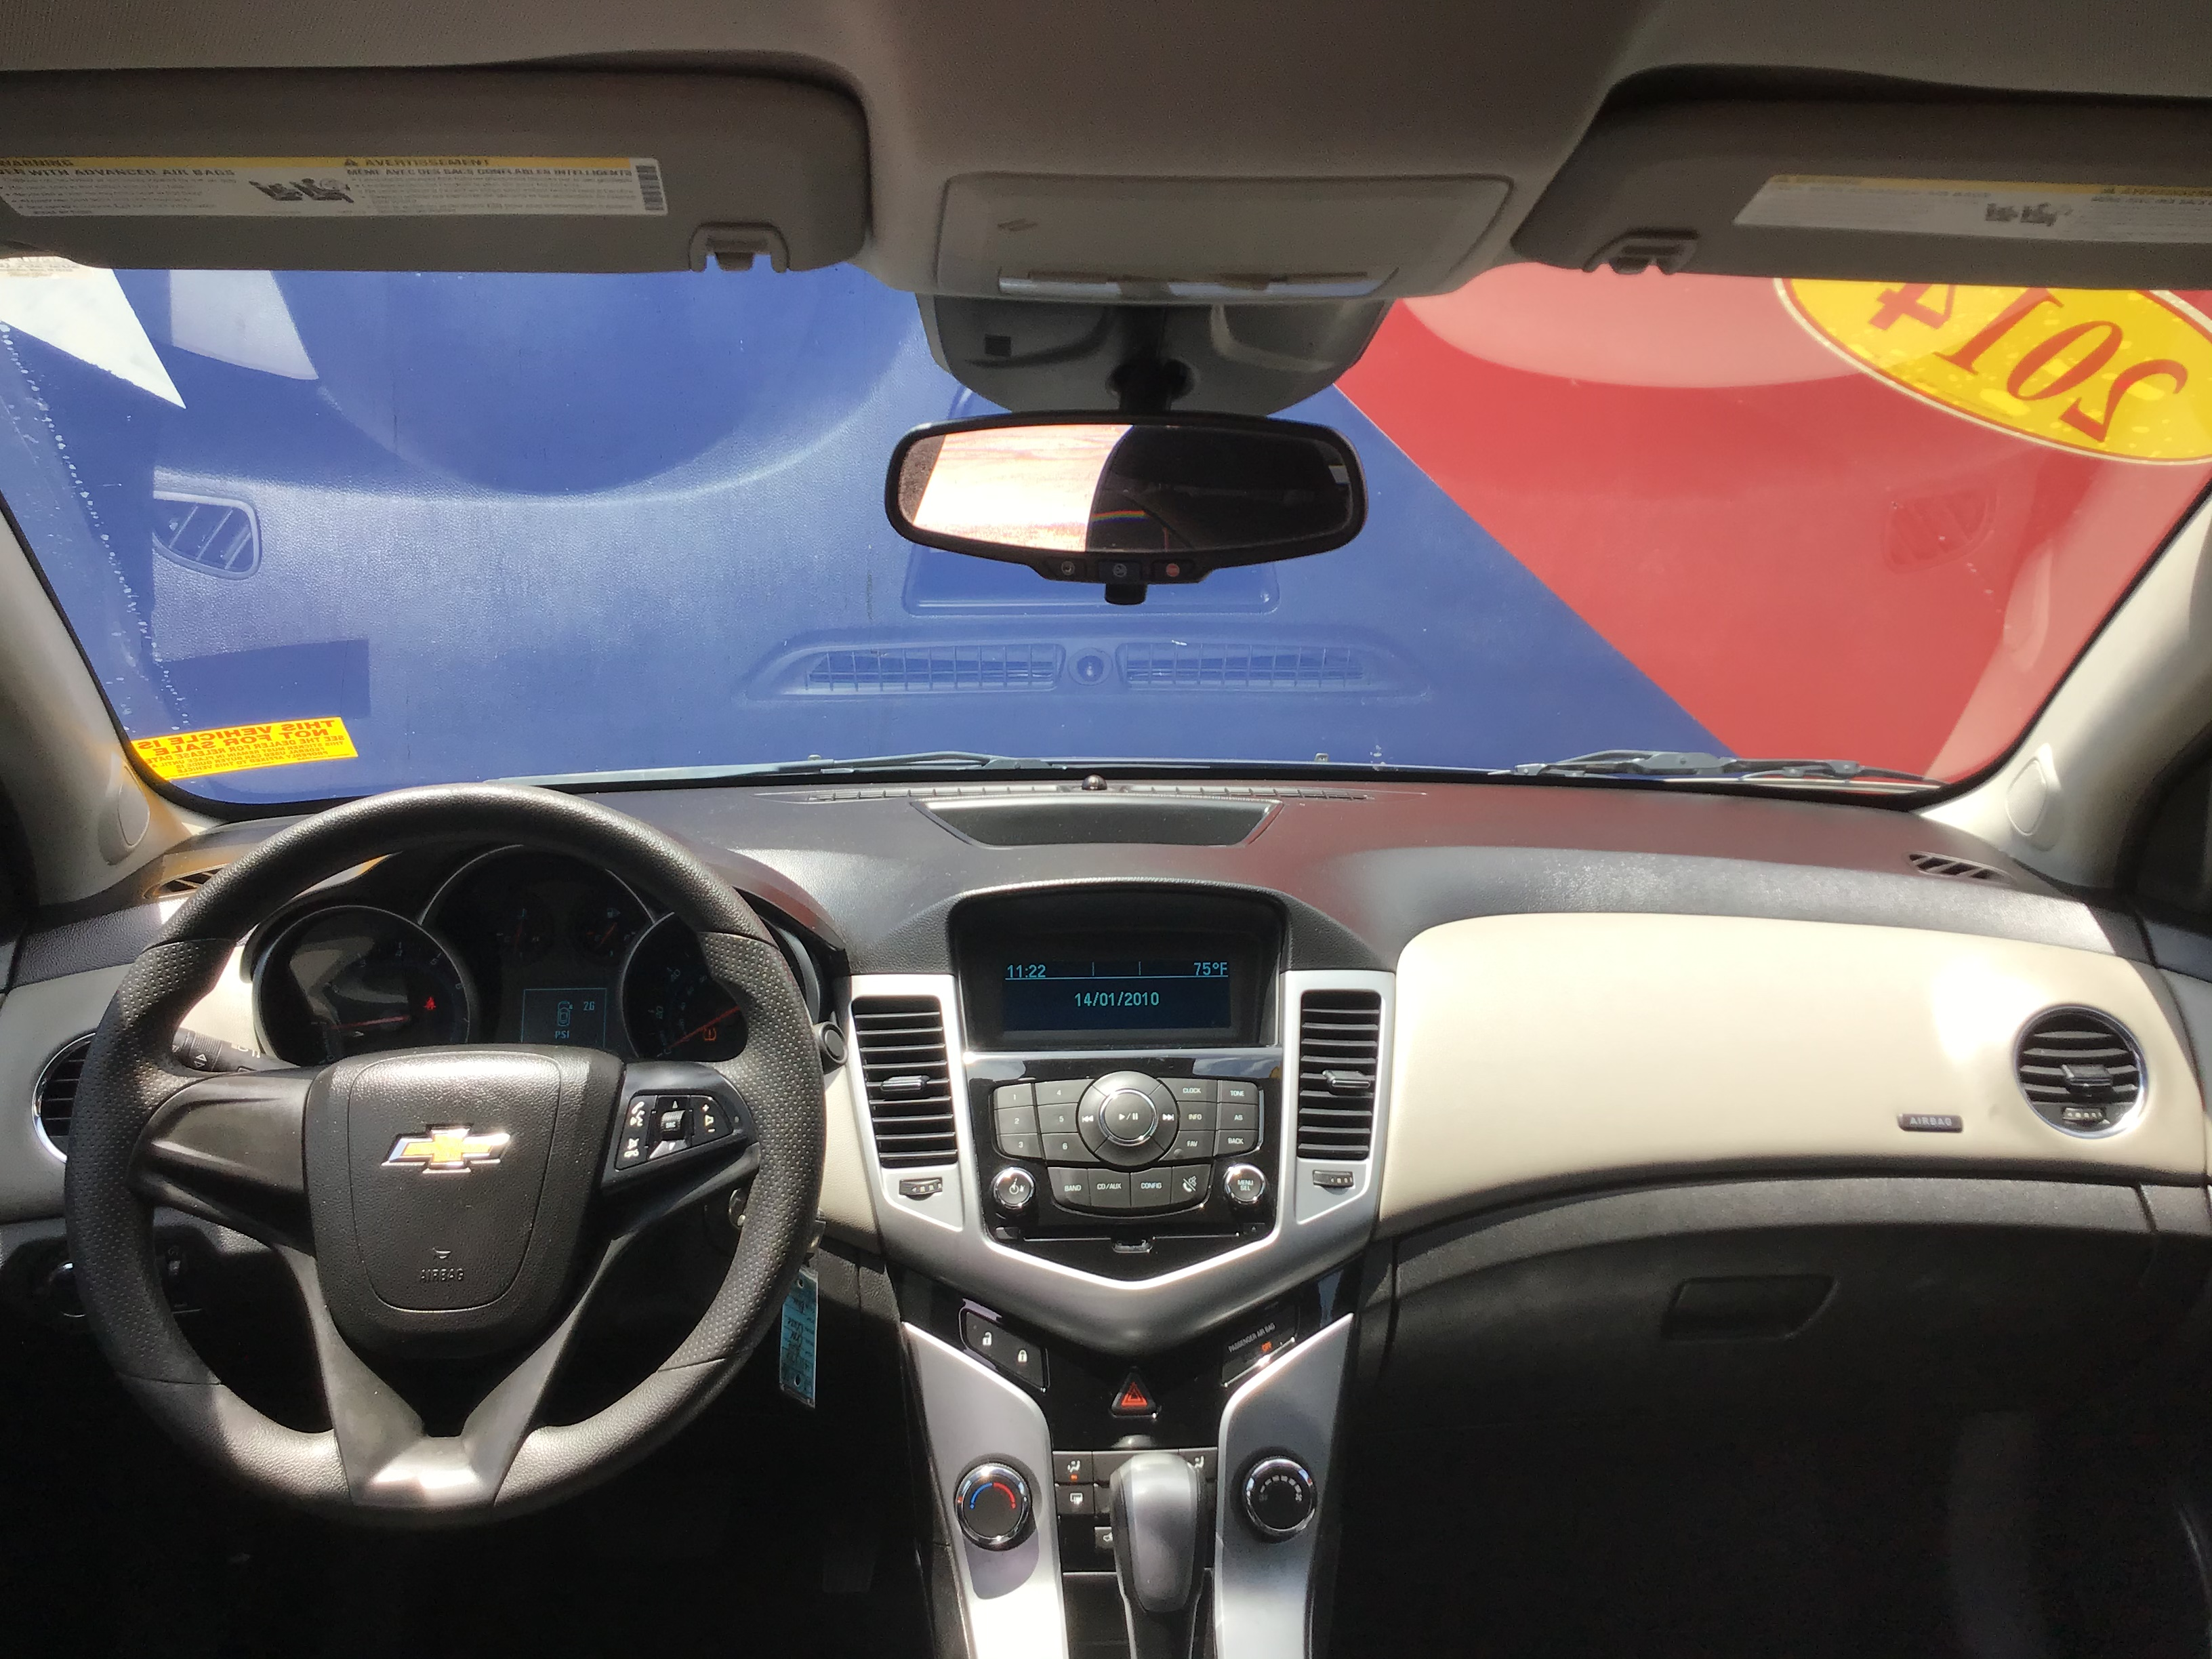 used vehicle - Sedan CHEVROLET CRUZE 2014